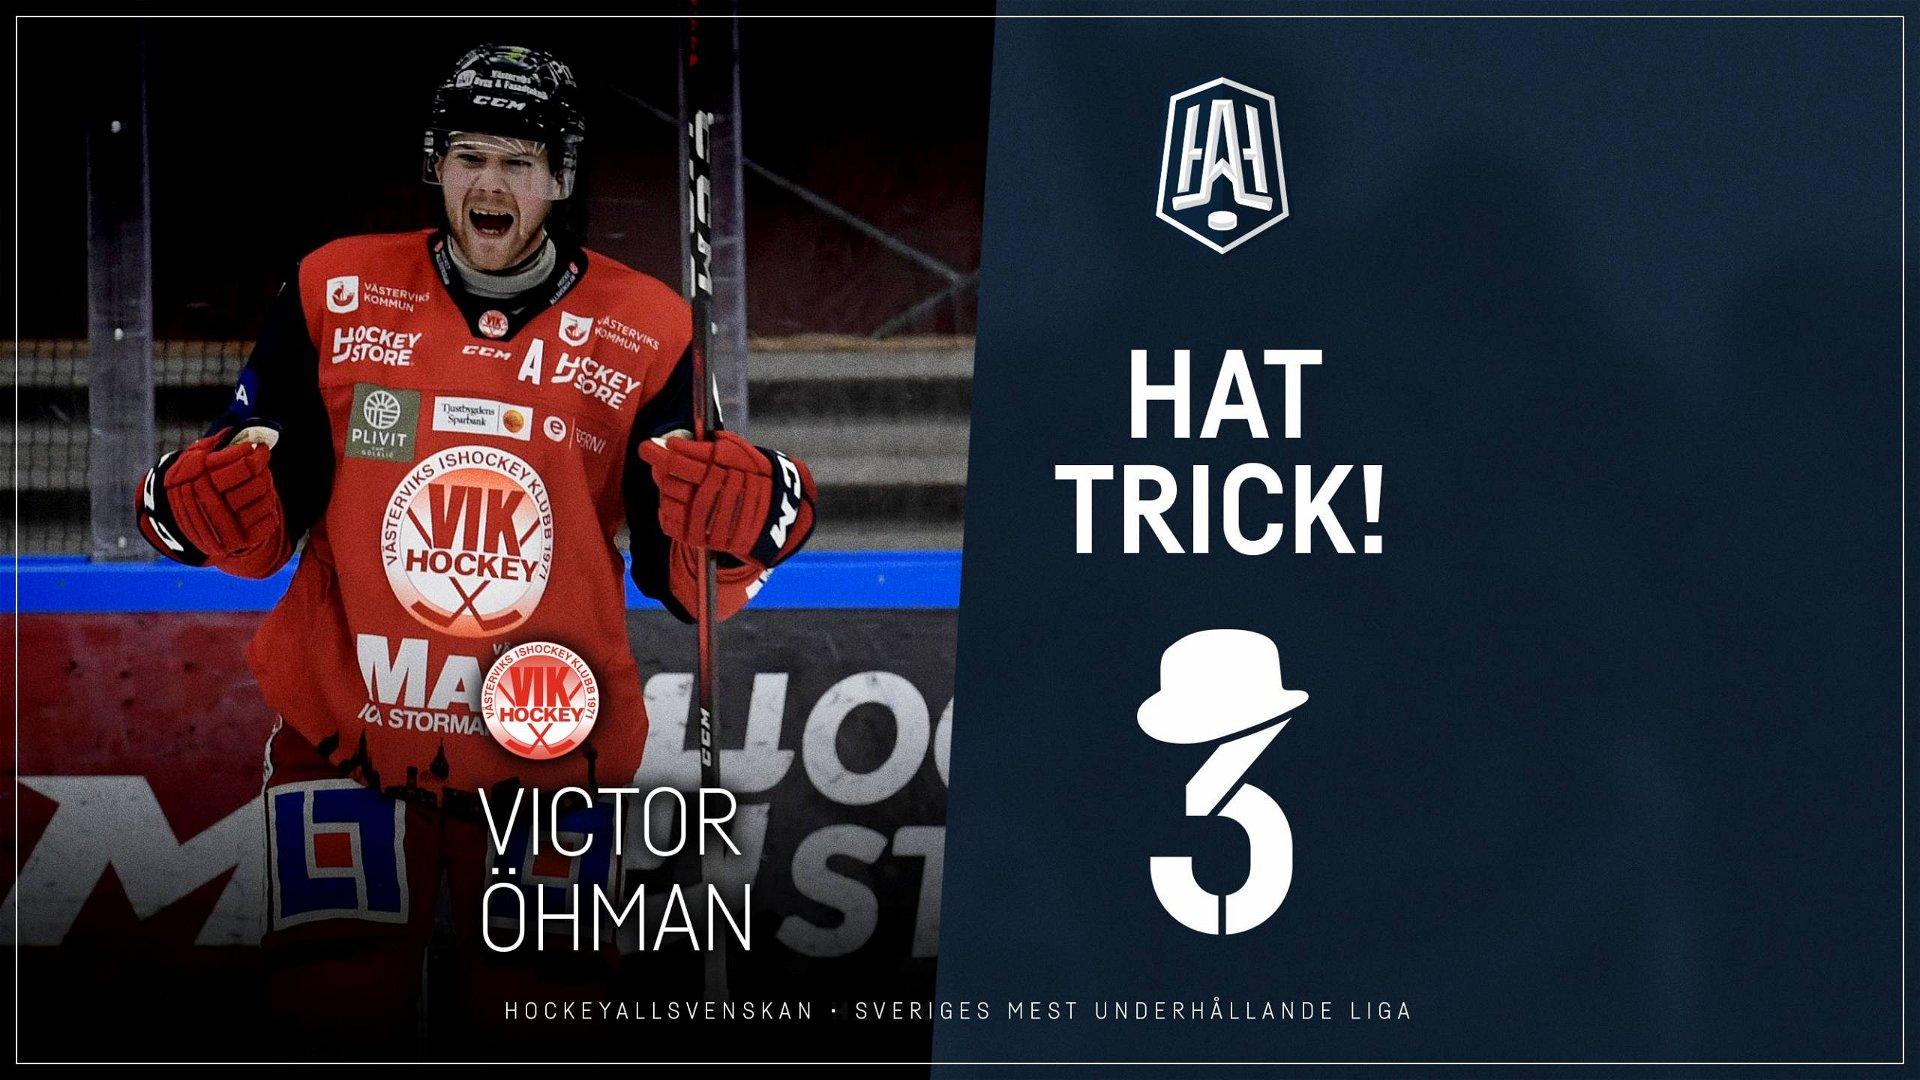 Hattrick: Victor Öhman, Västervik